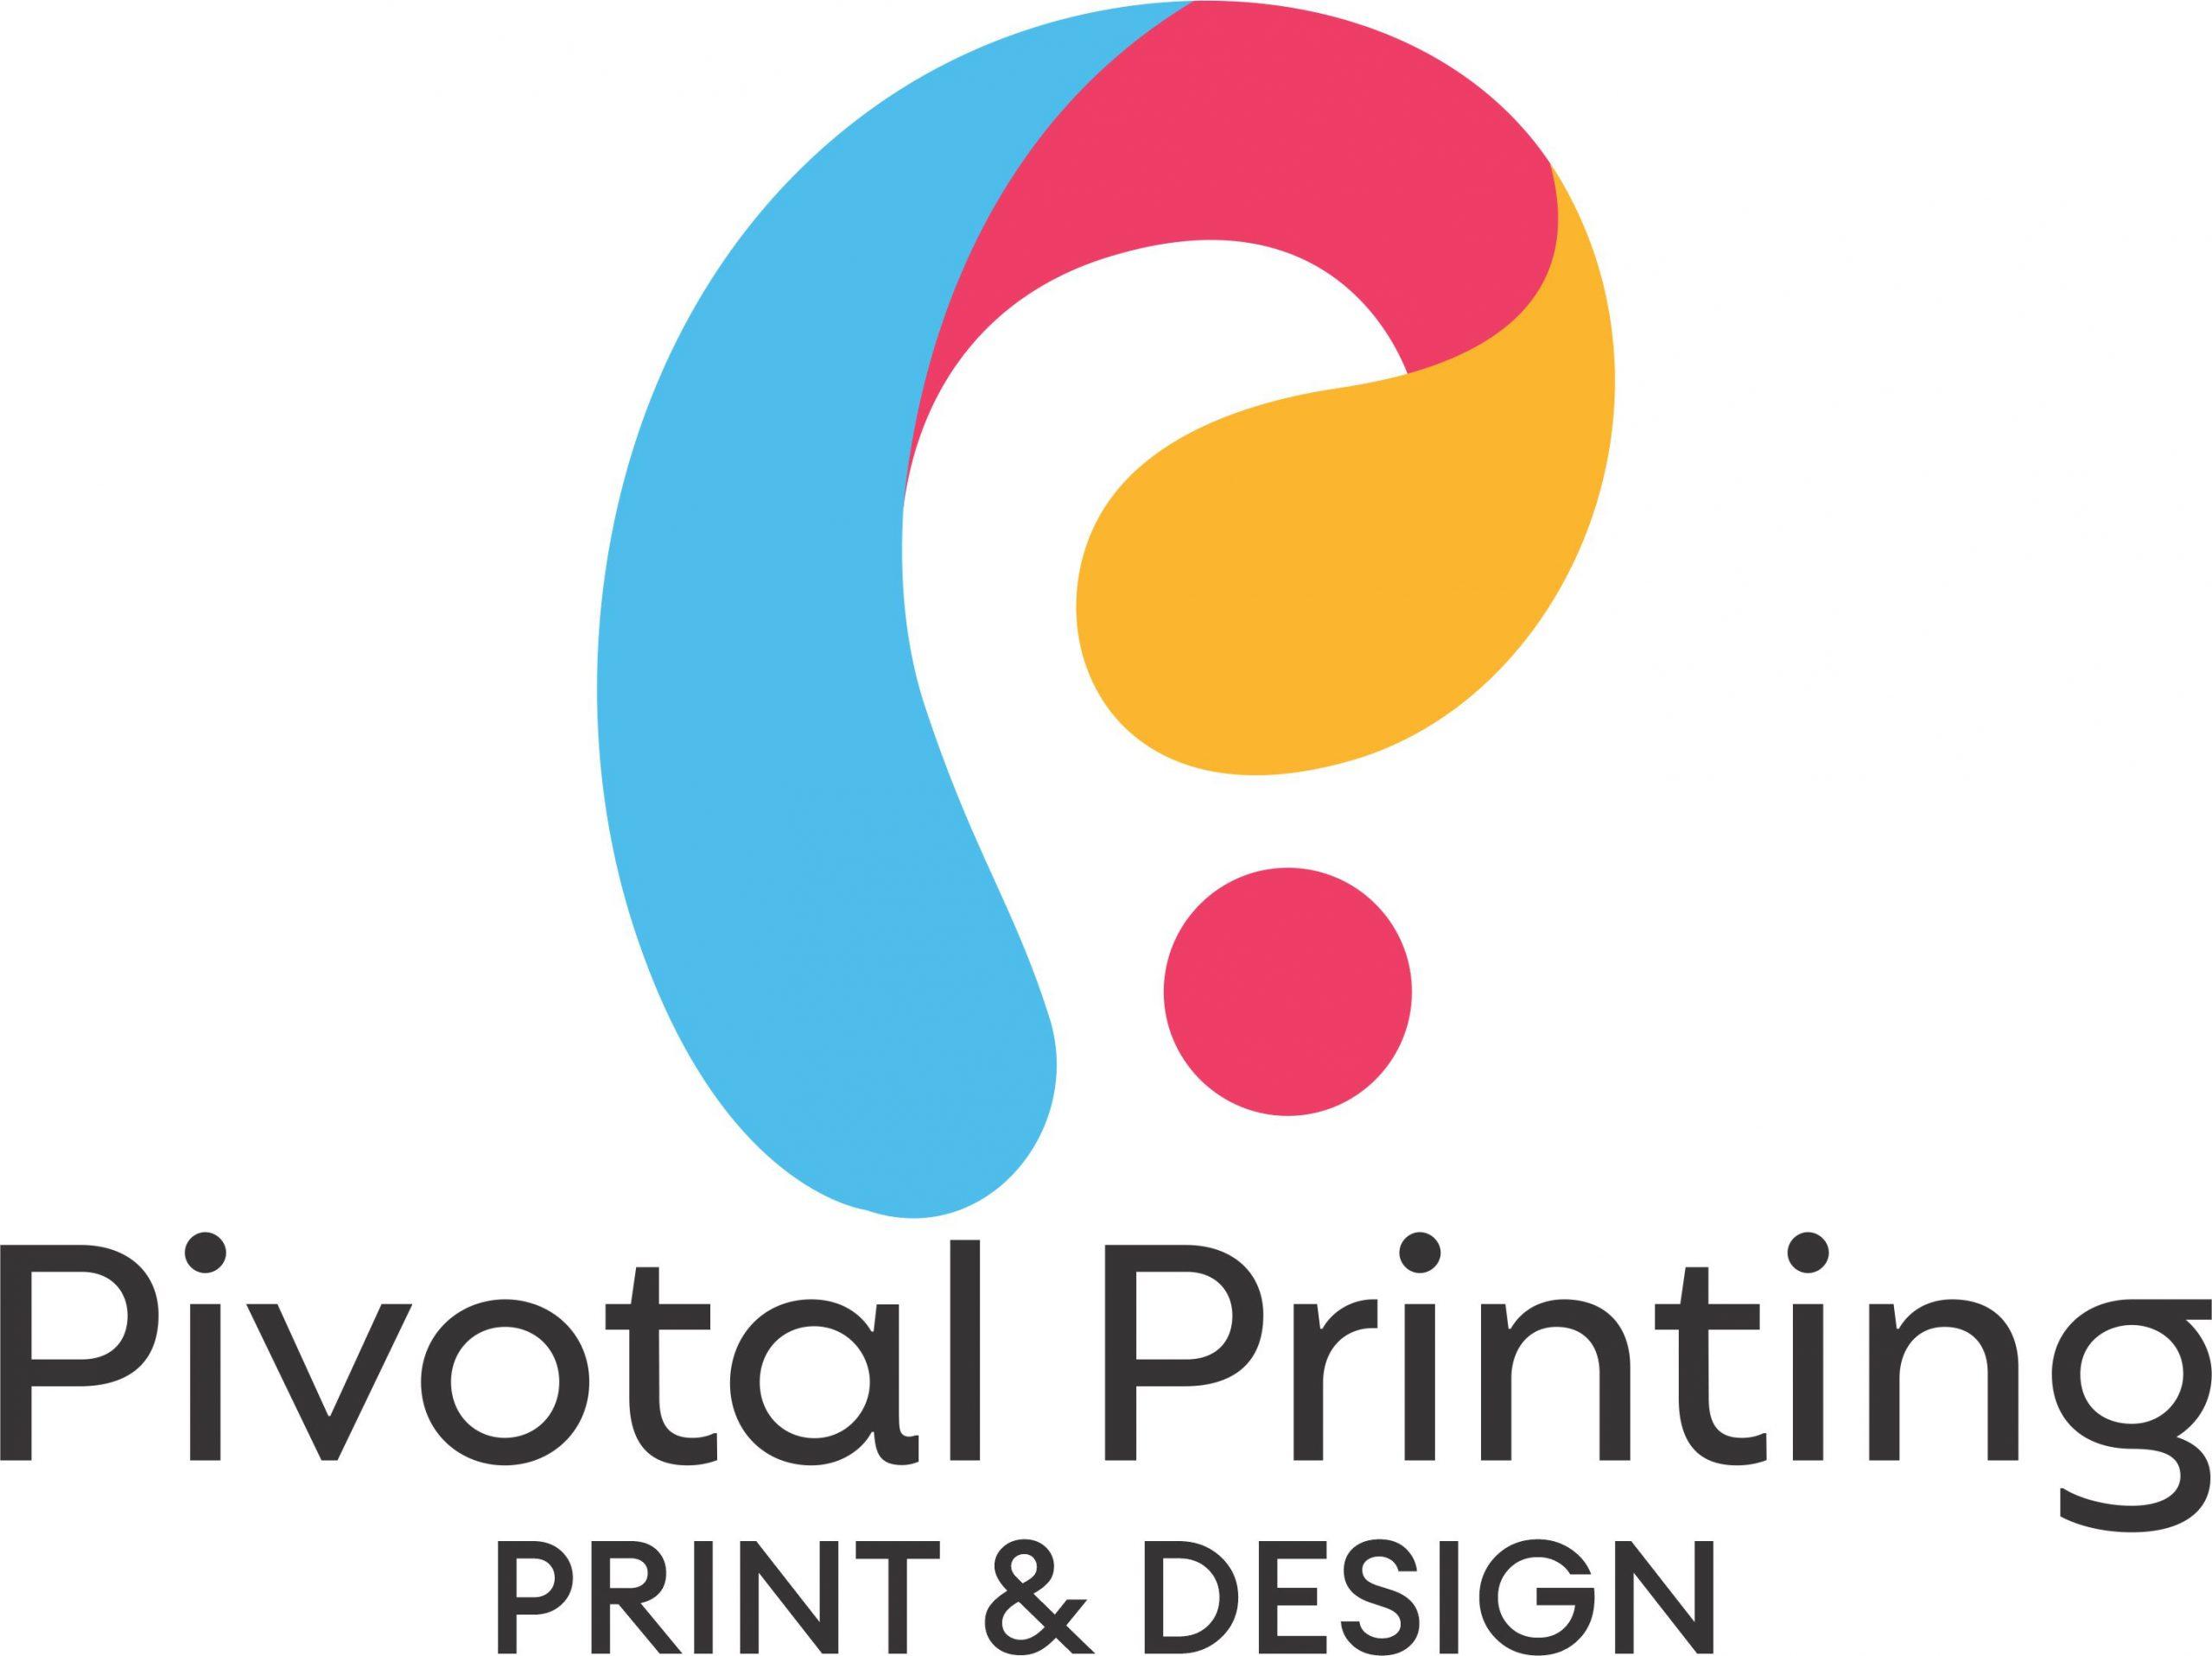 Pivotal Printing – Print & Design